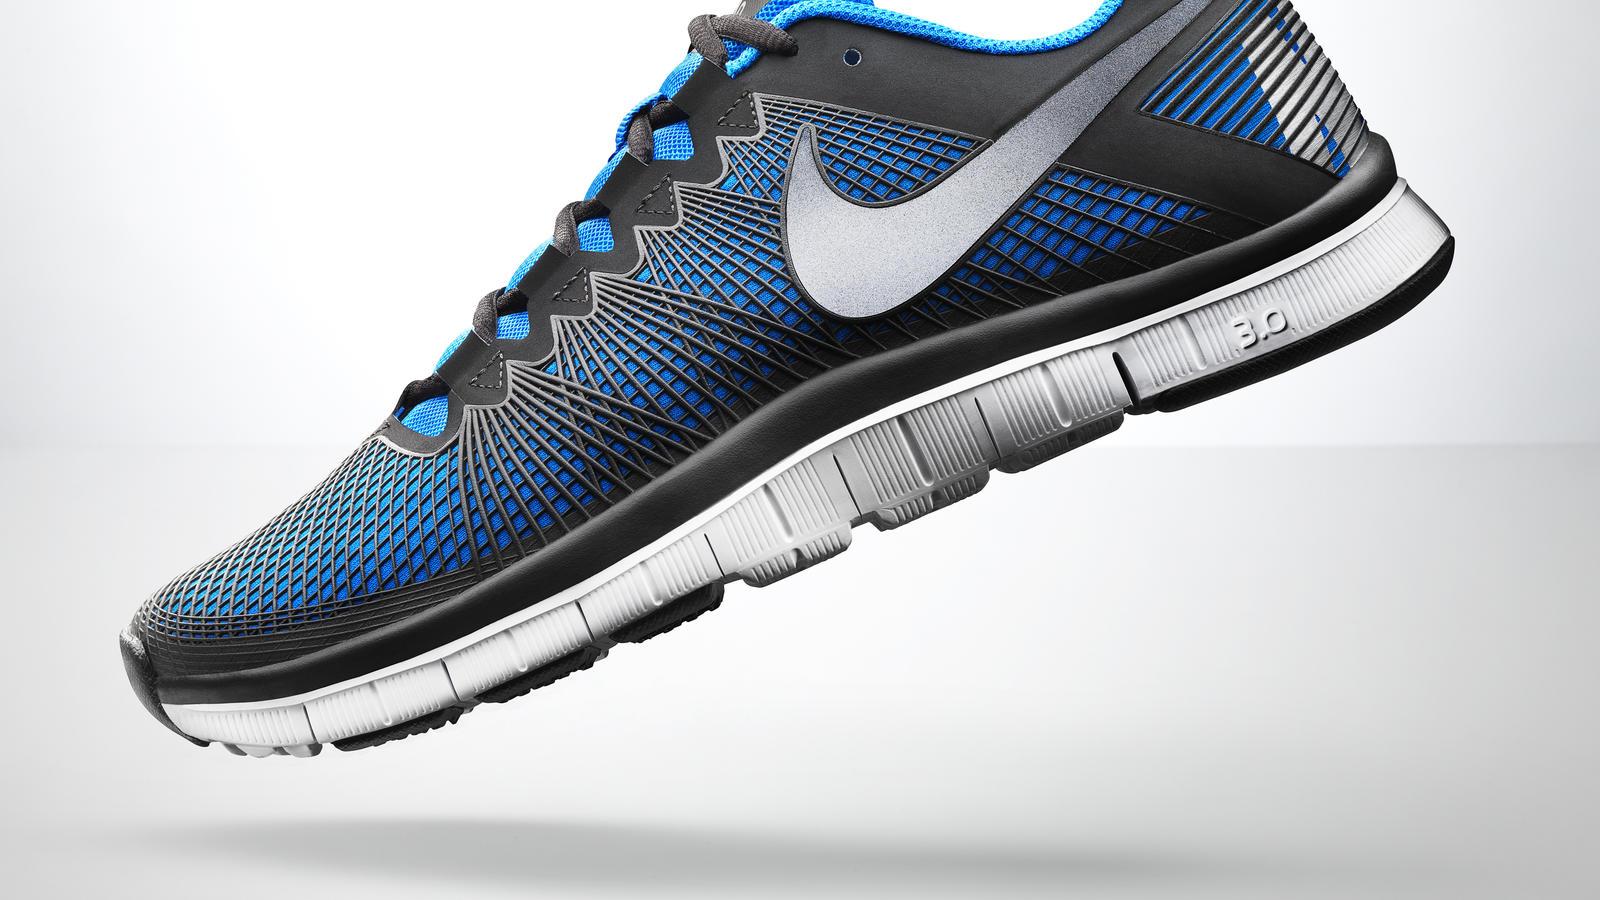 newest d633e 297e4 Nike Free Trainer 3.0 - Spring 2013